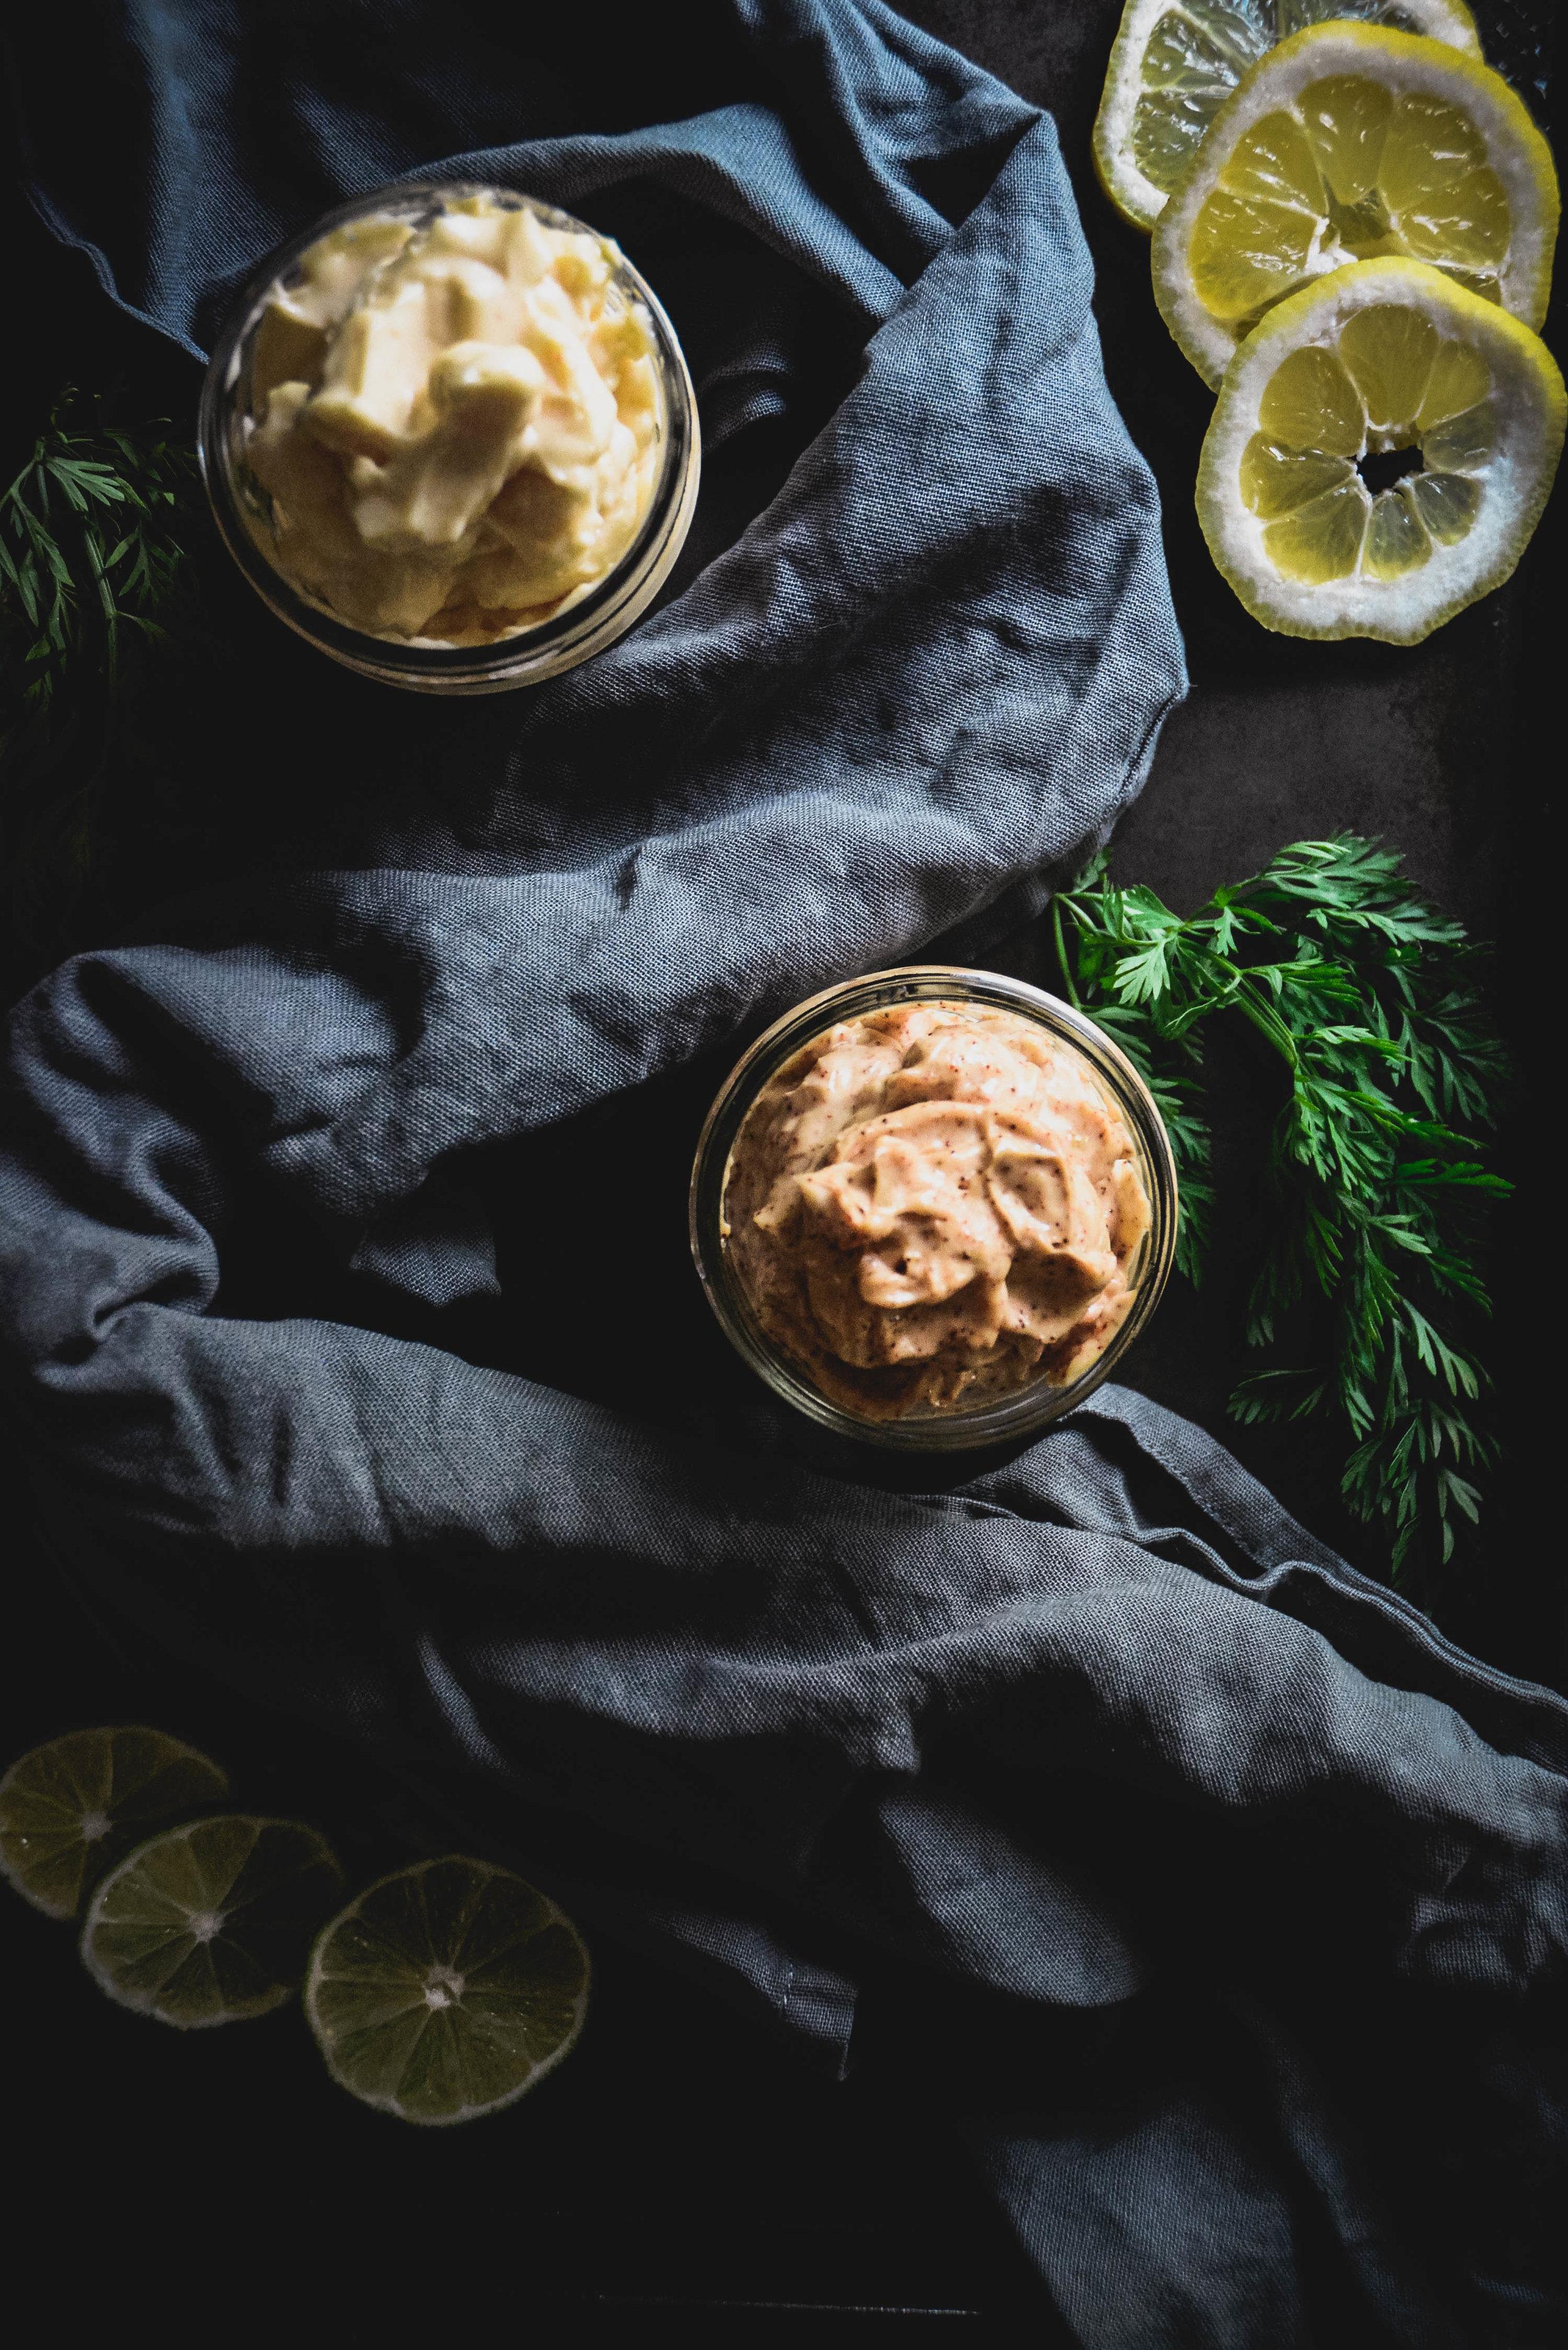 paleo mayo and chipotle lime paleo mayo